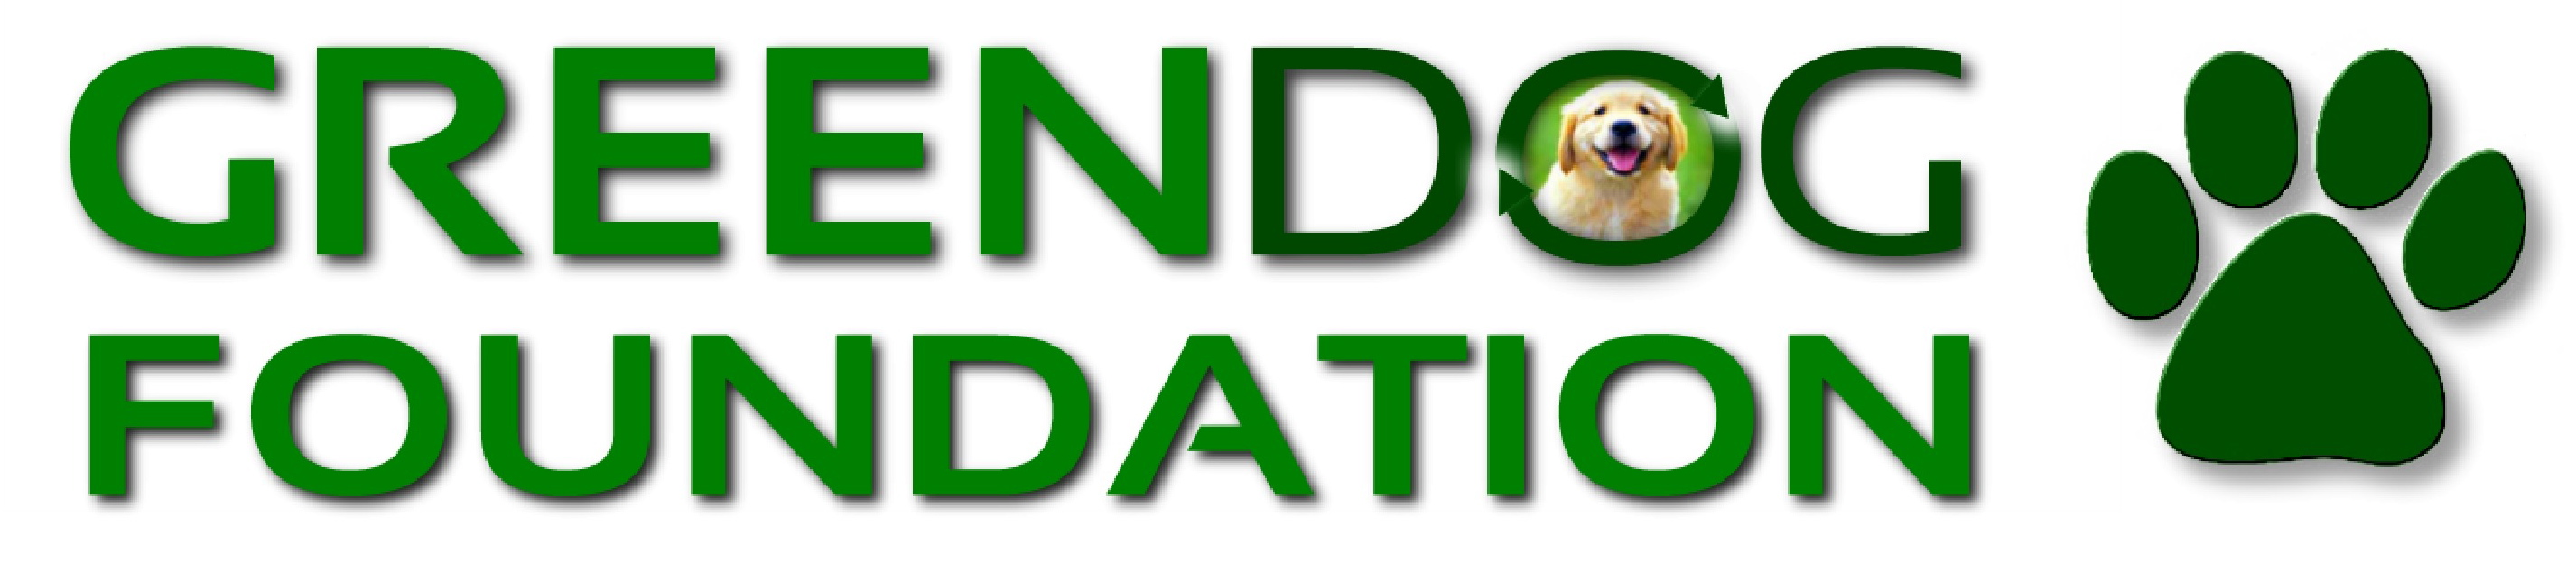 Greendog Foundation